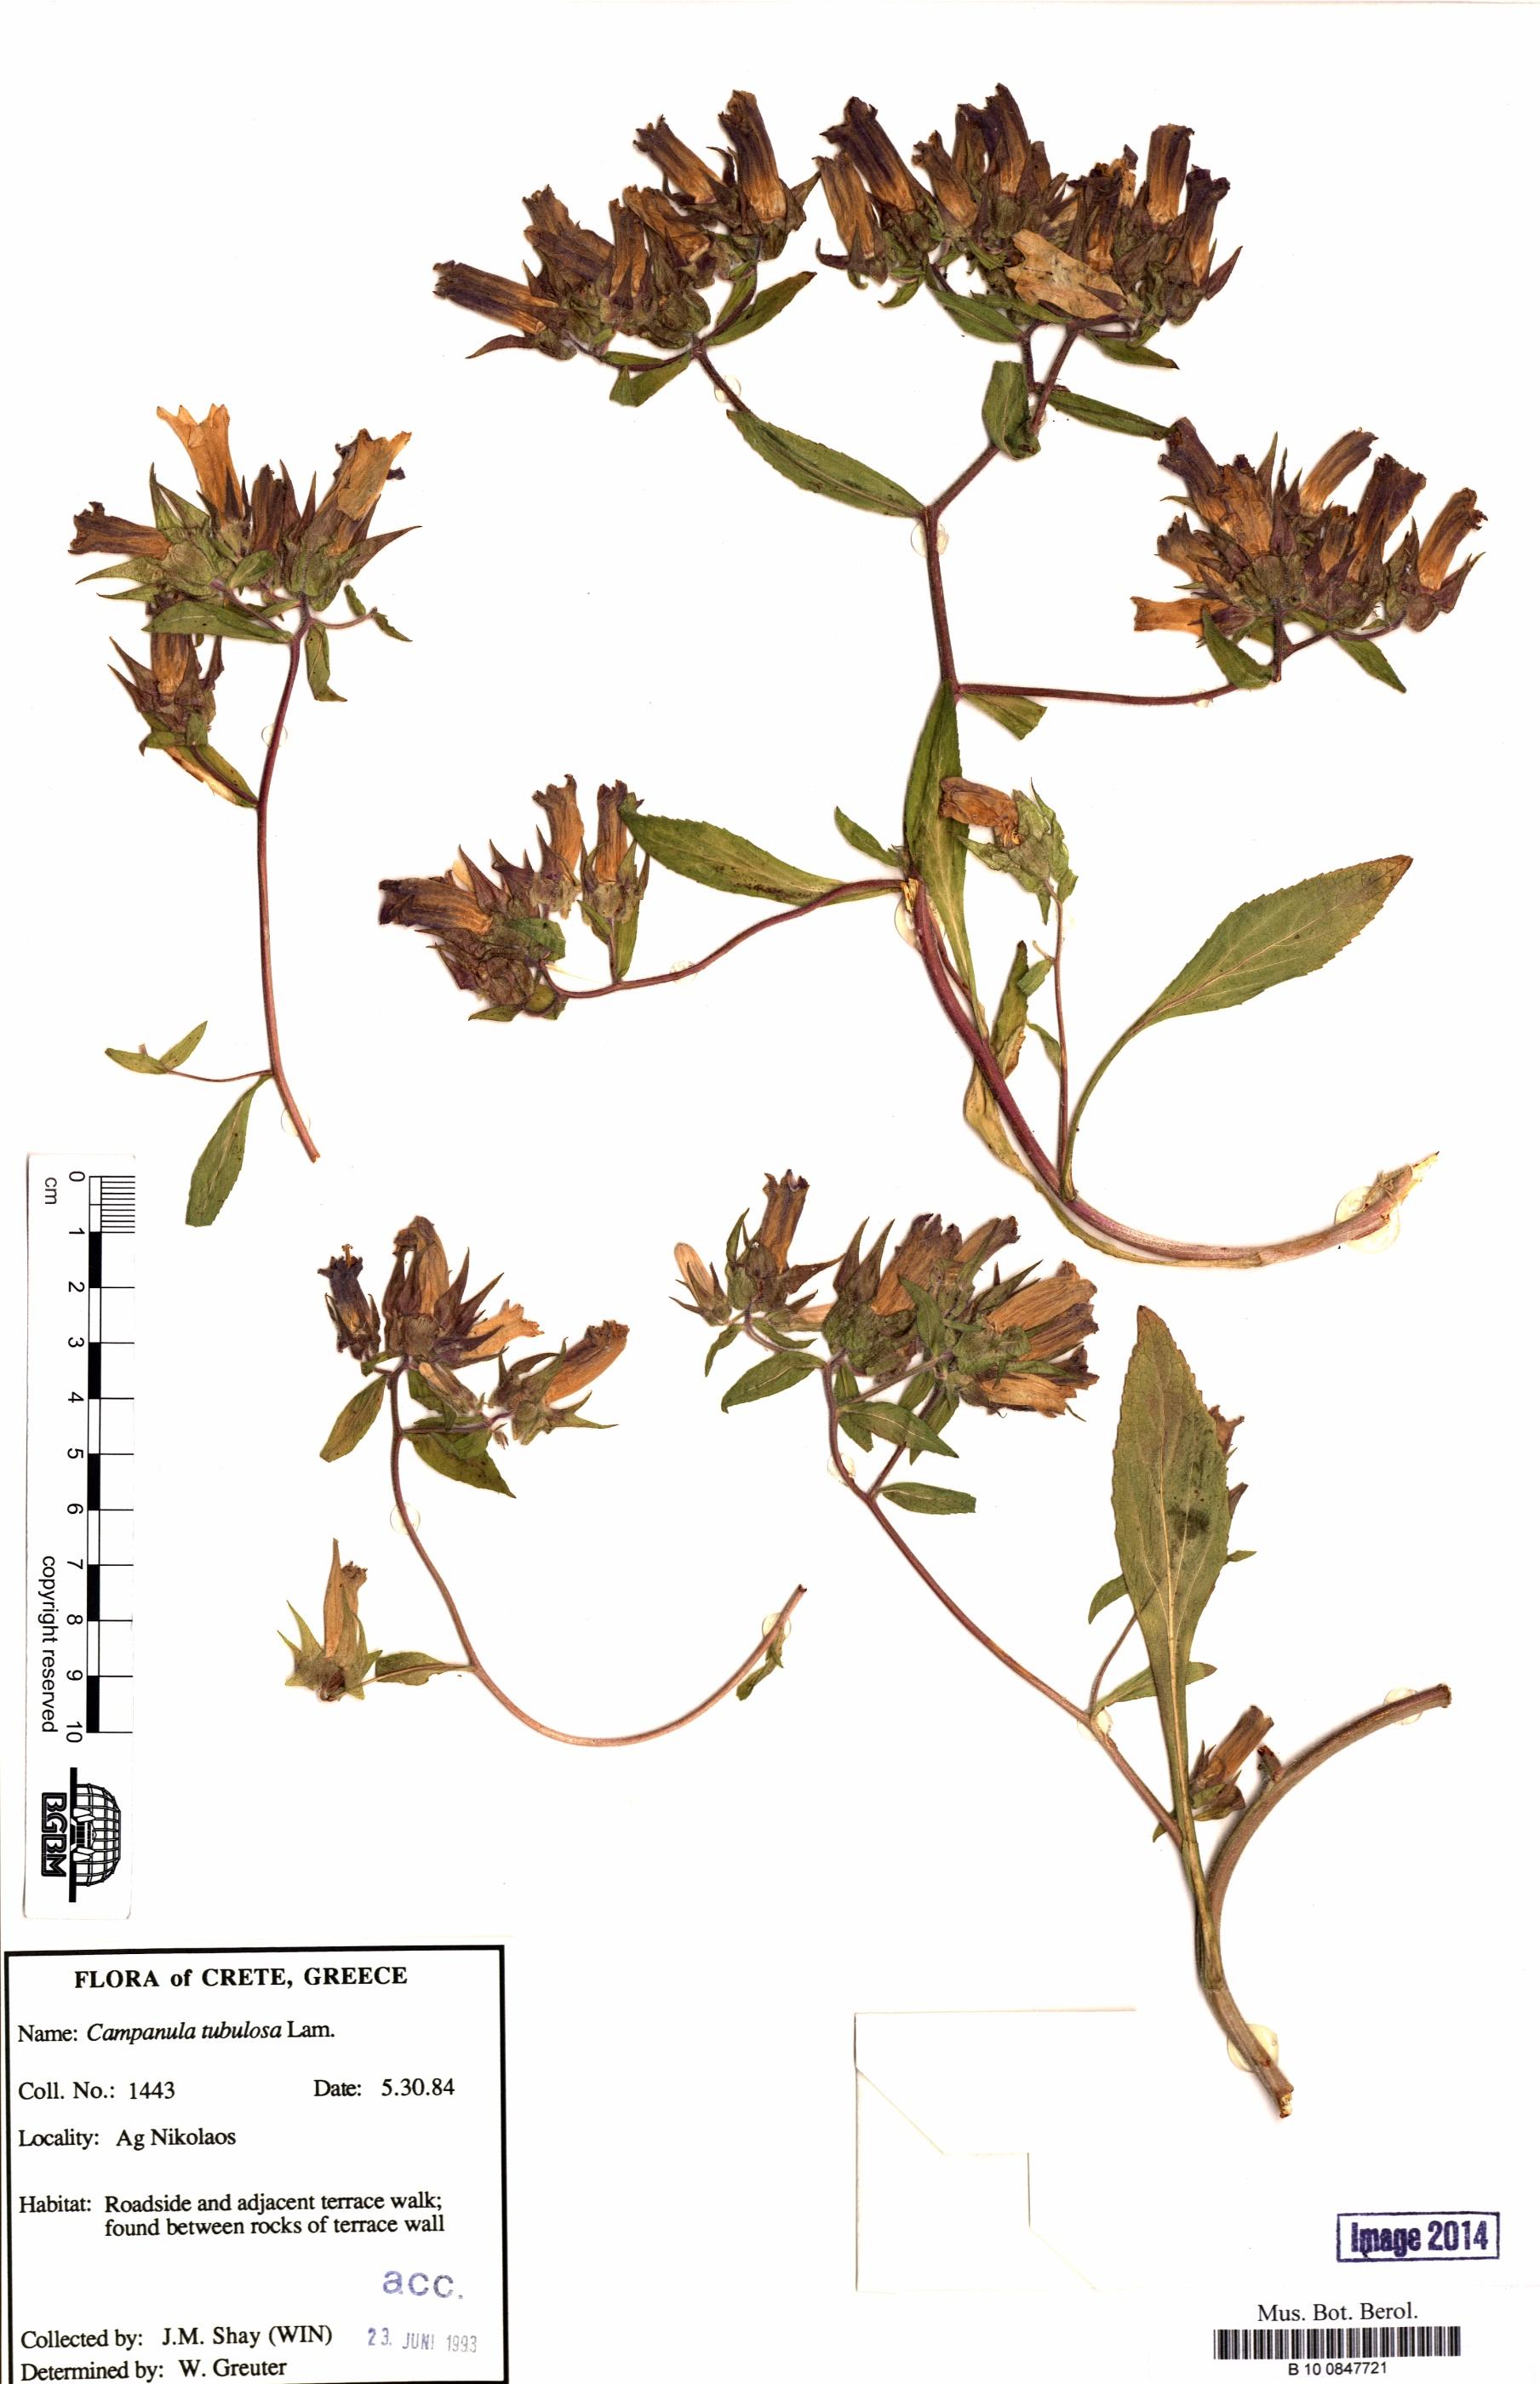 http://ww2.bgbm.org/herbarium/images/B/10/08/47/72/B_10_0847721.jpg